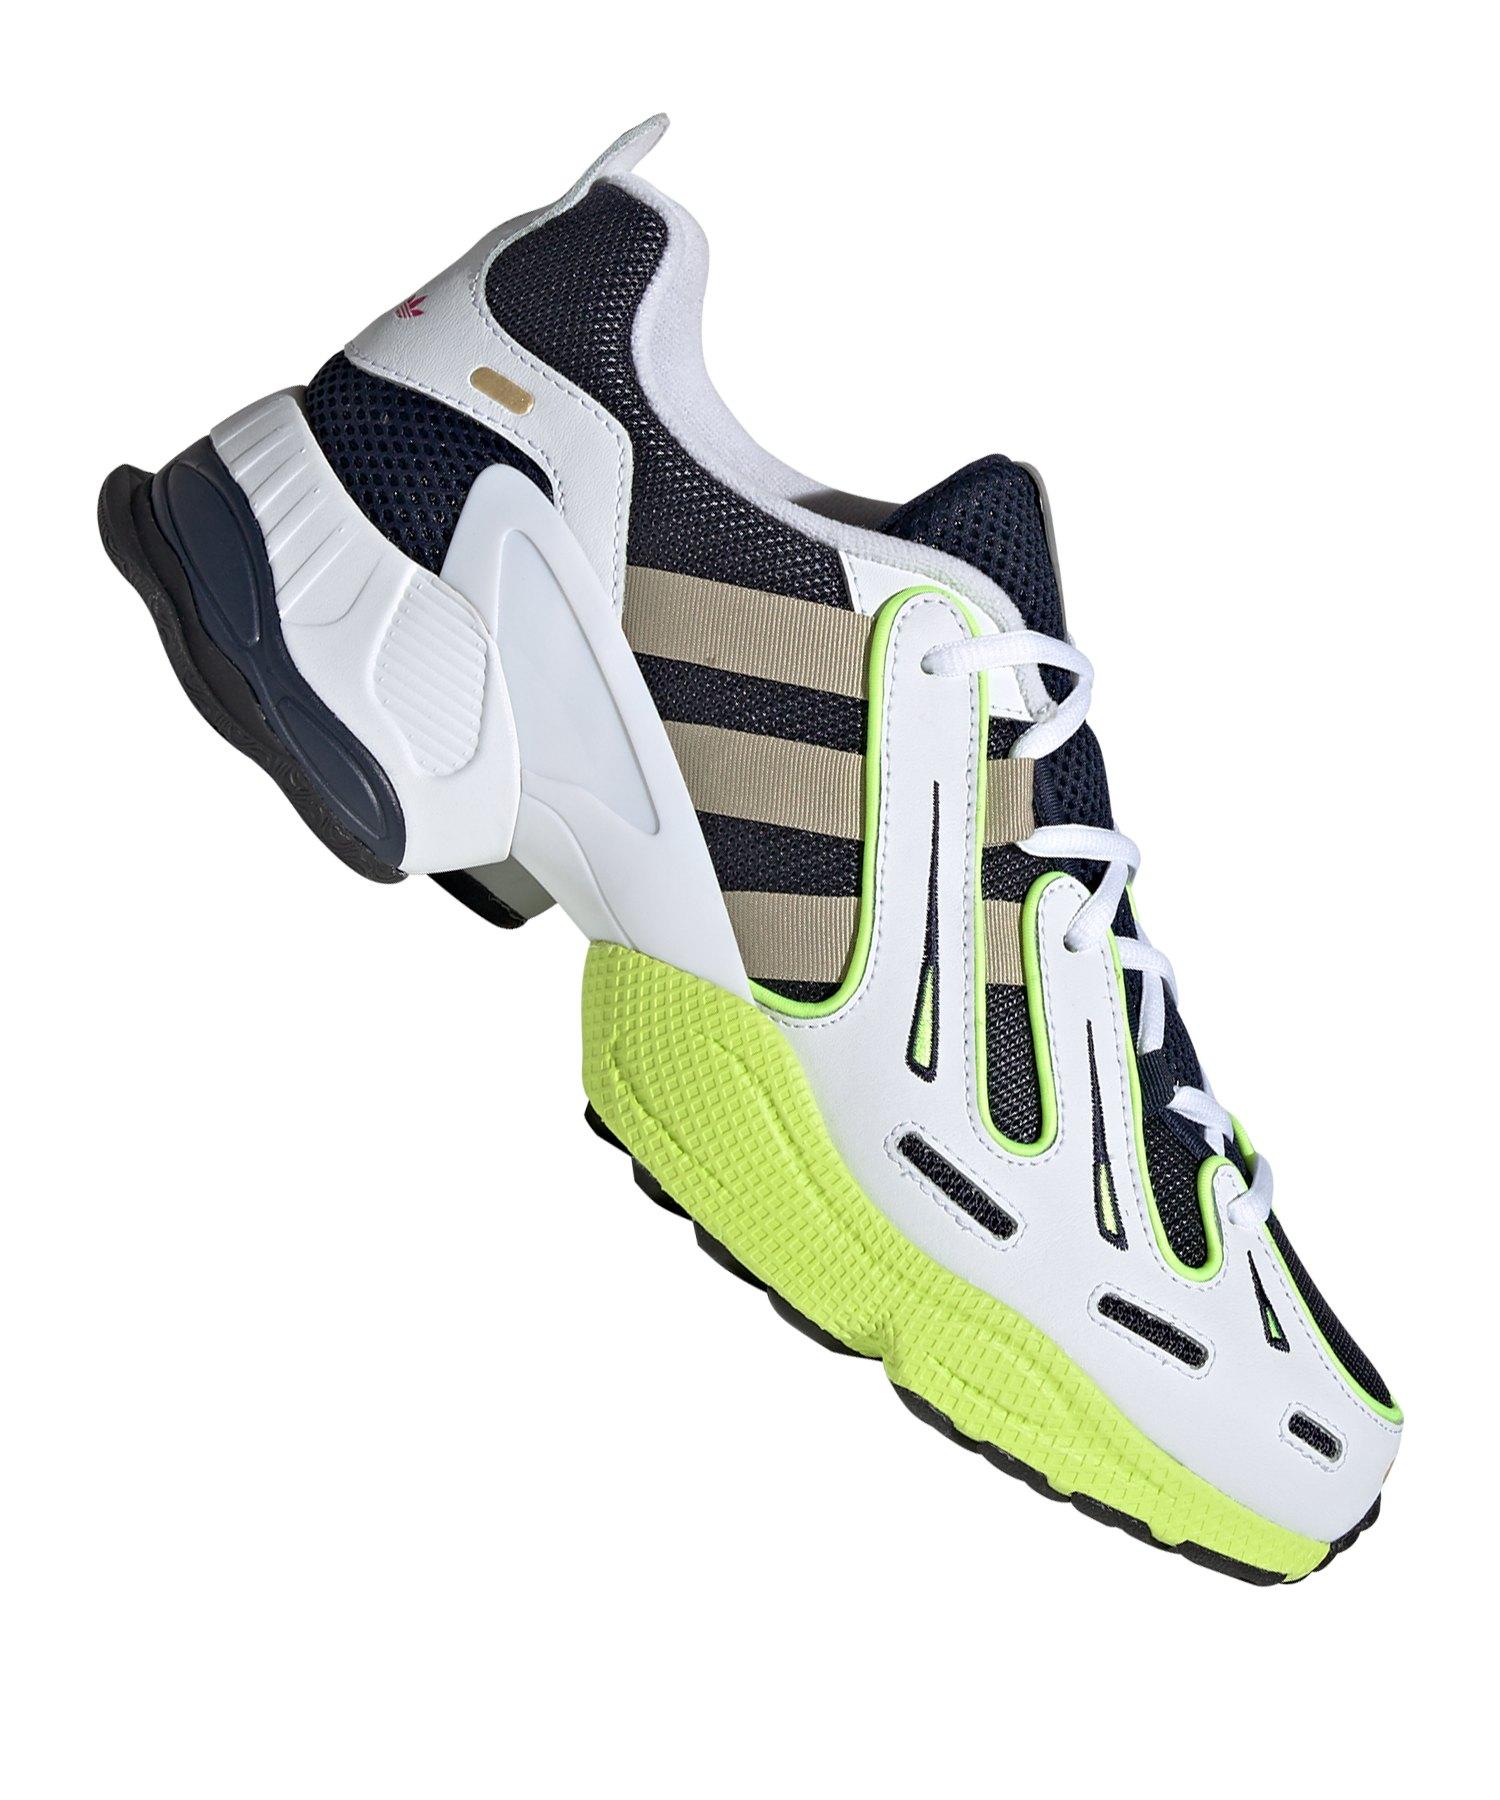 Originals Blau Adidas Herren Eqt Gazelle Sneaker 6fgIbyY7v